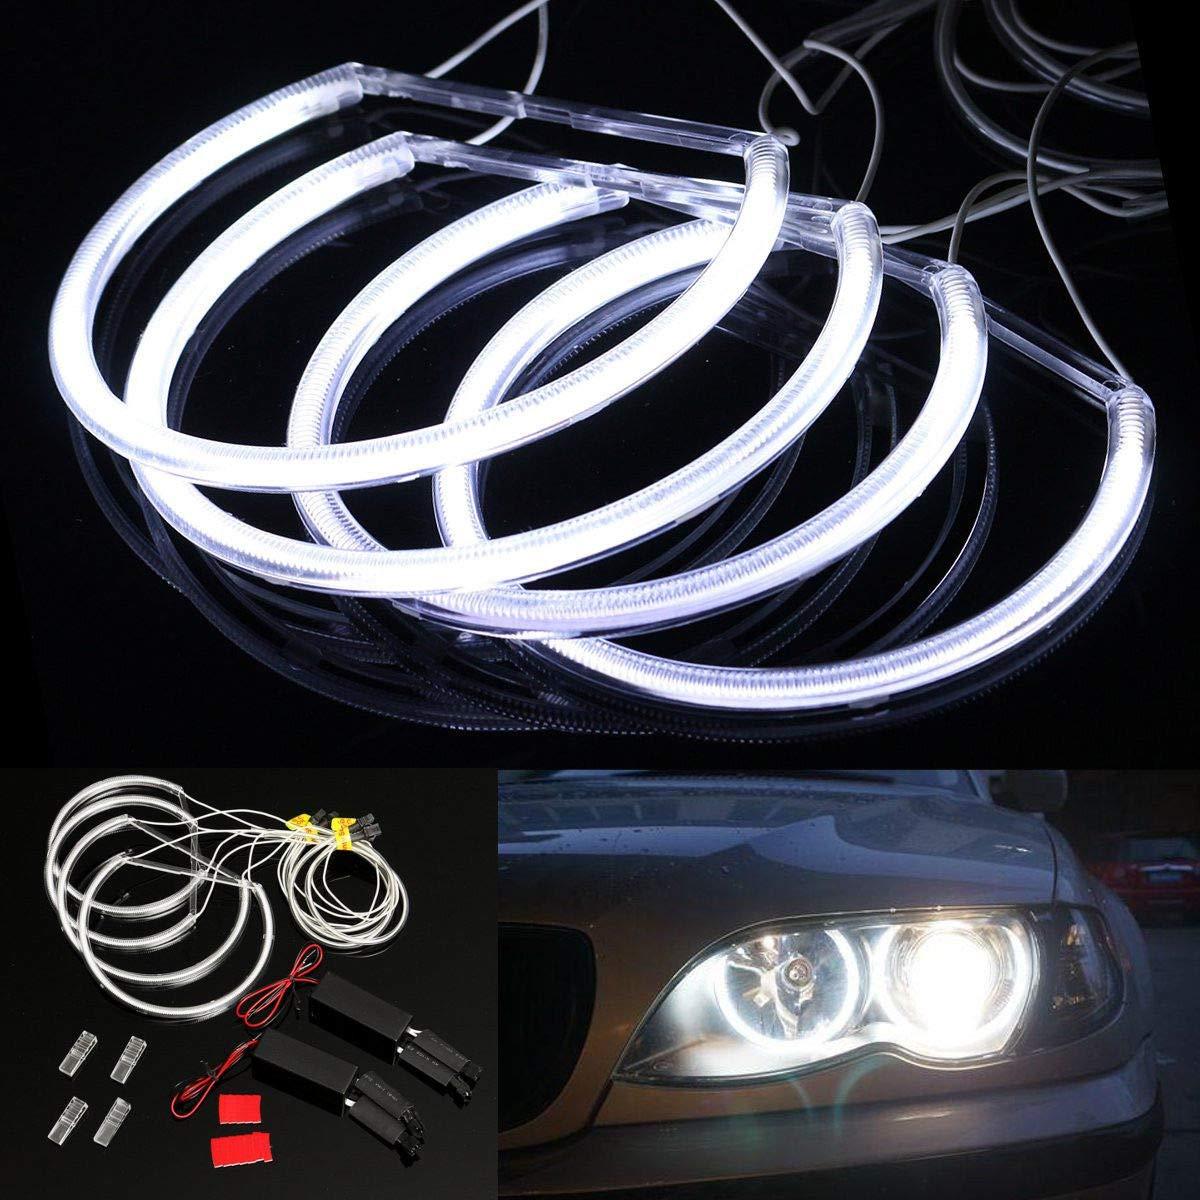 Sunsbell CCFL Car Angel Eagle Eyes Light Tube Headlight White Headlamp for E36 3 E38 7 E39 5 E46 4 pcs